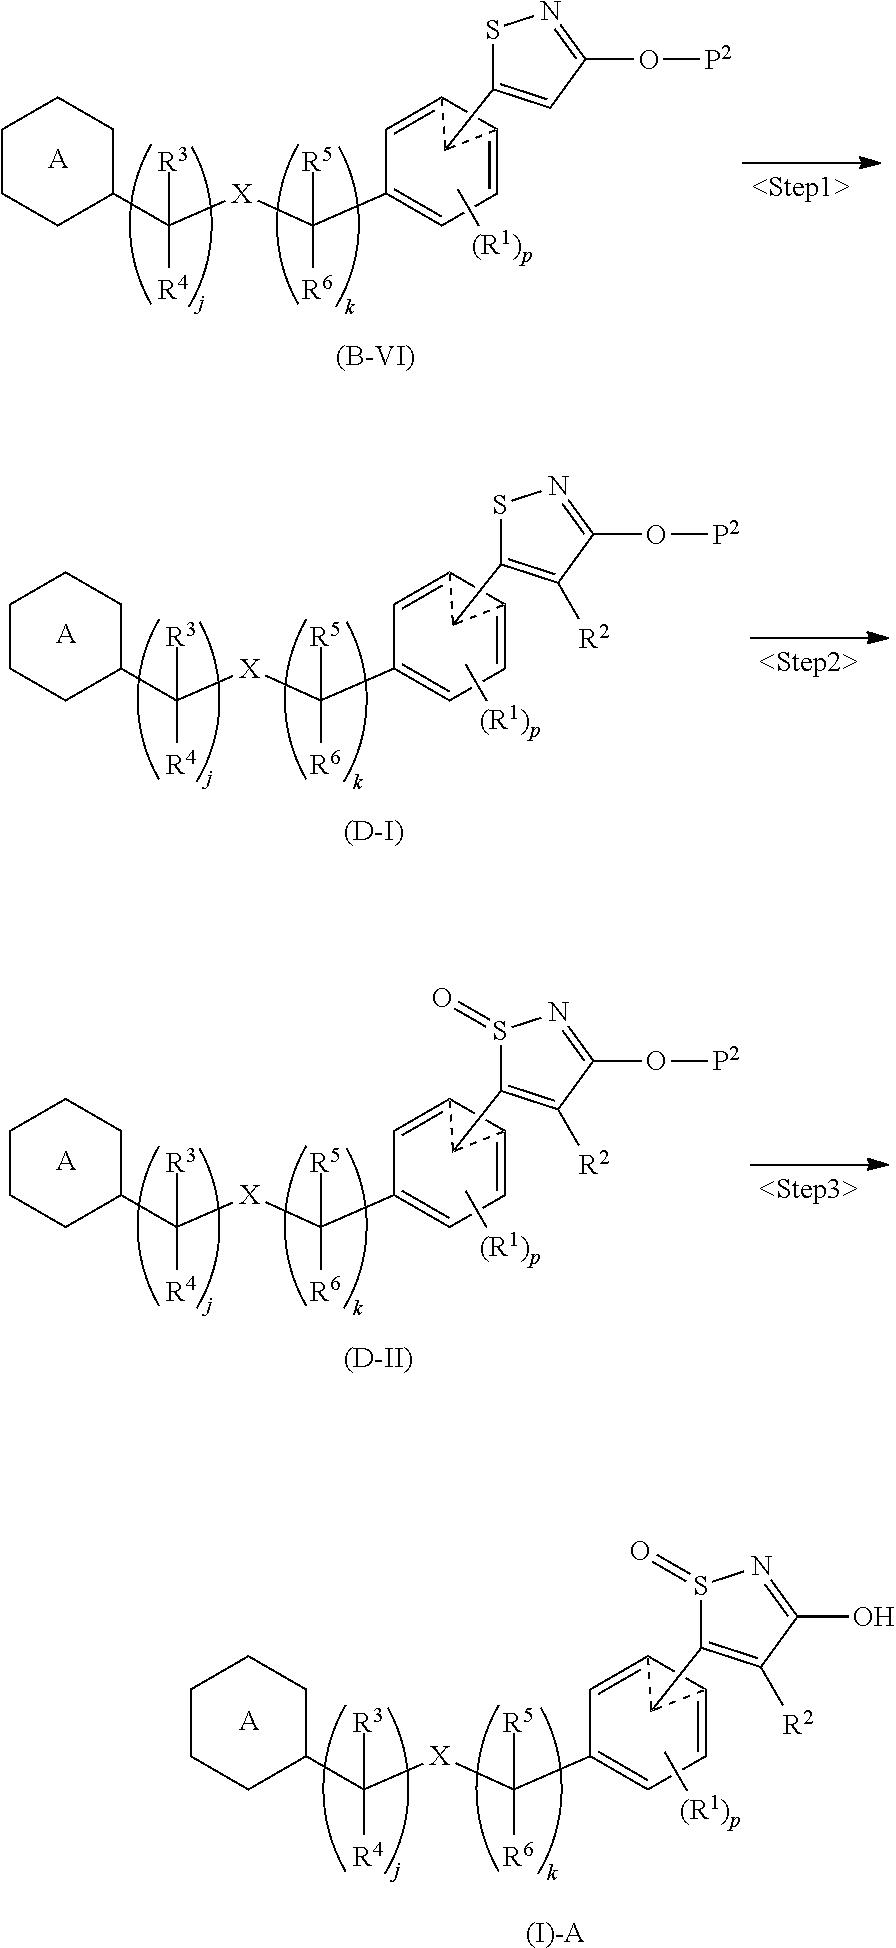 us8557766b2 3 hydroxyisothiazole 1 oxide derivatives patents Diagram Body Areas